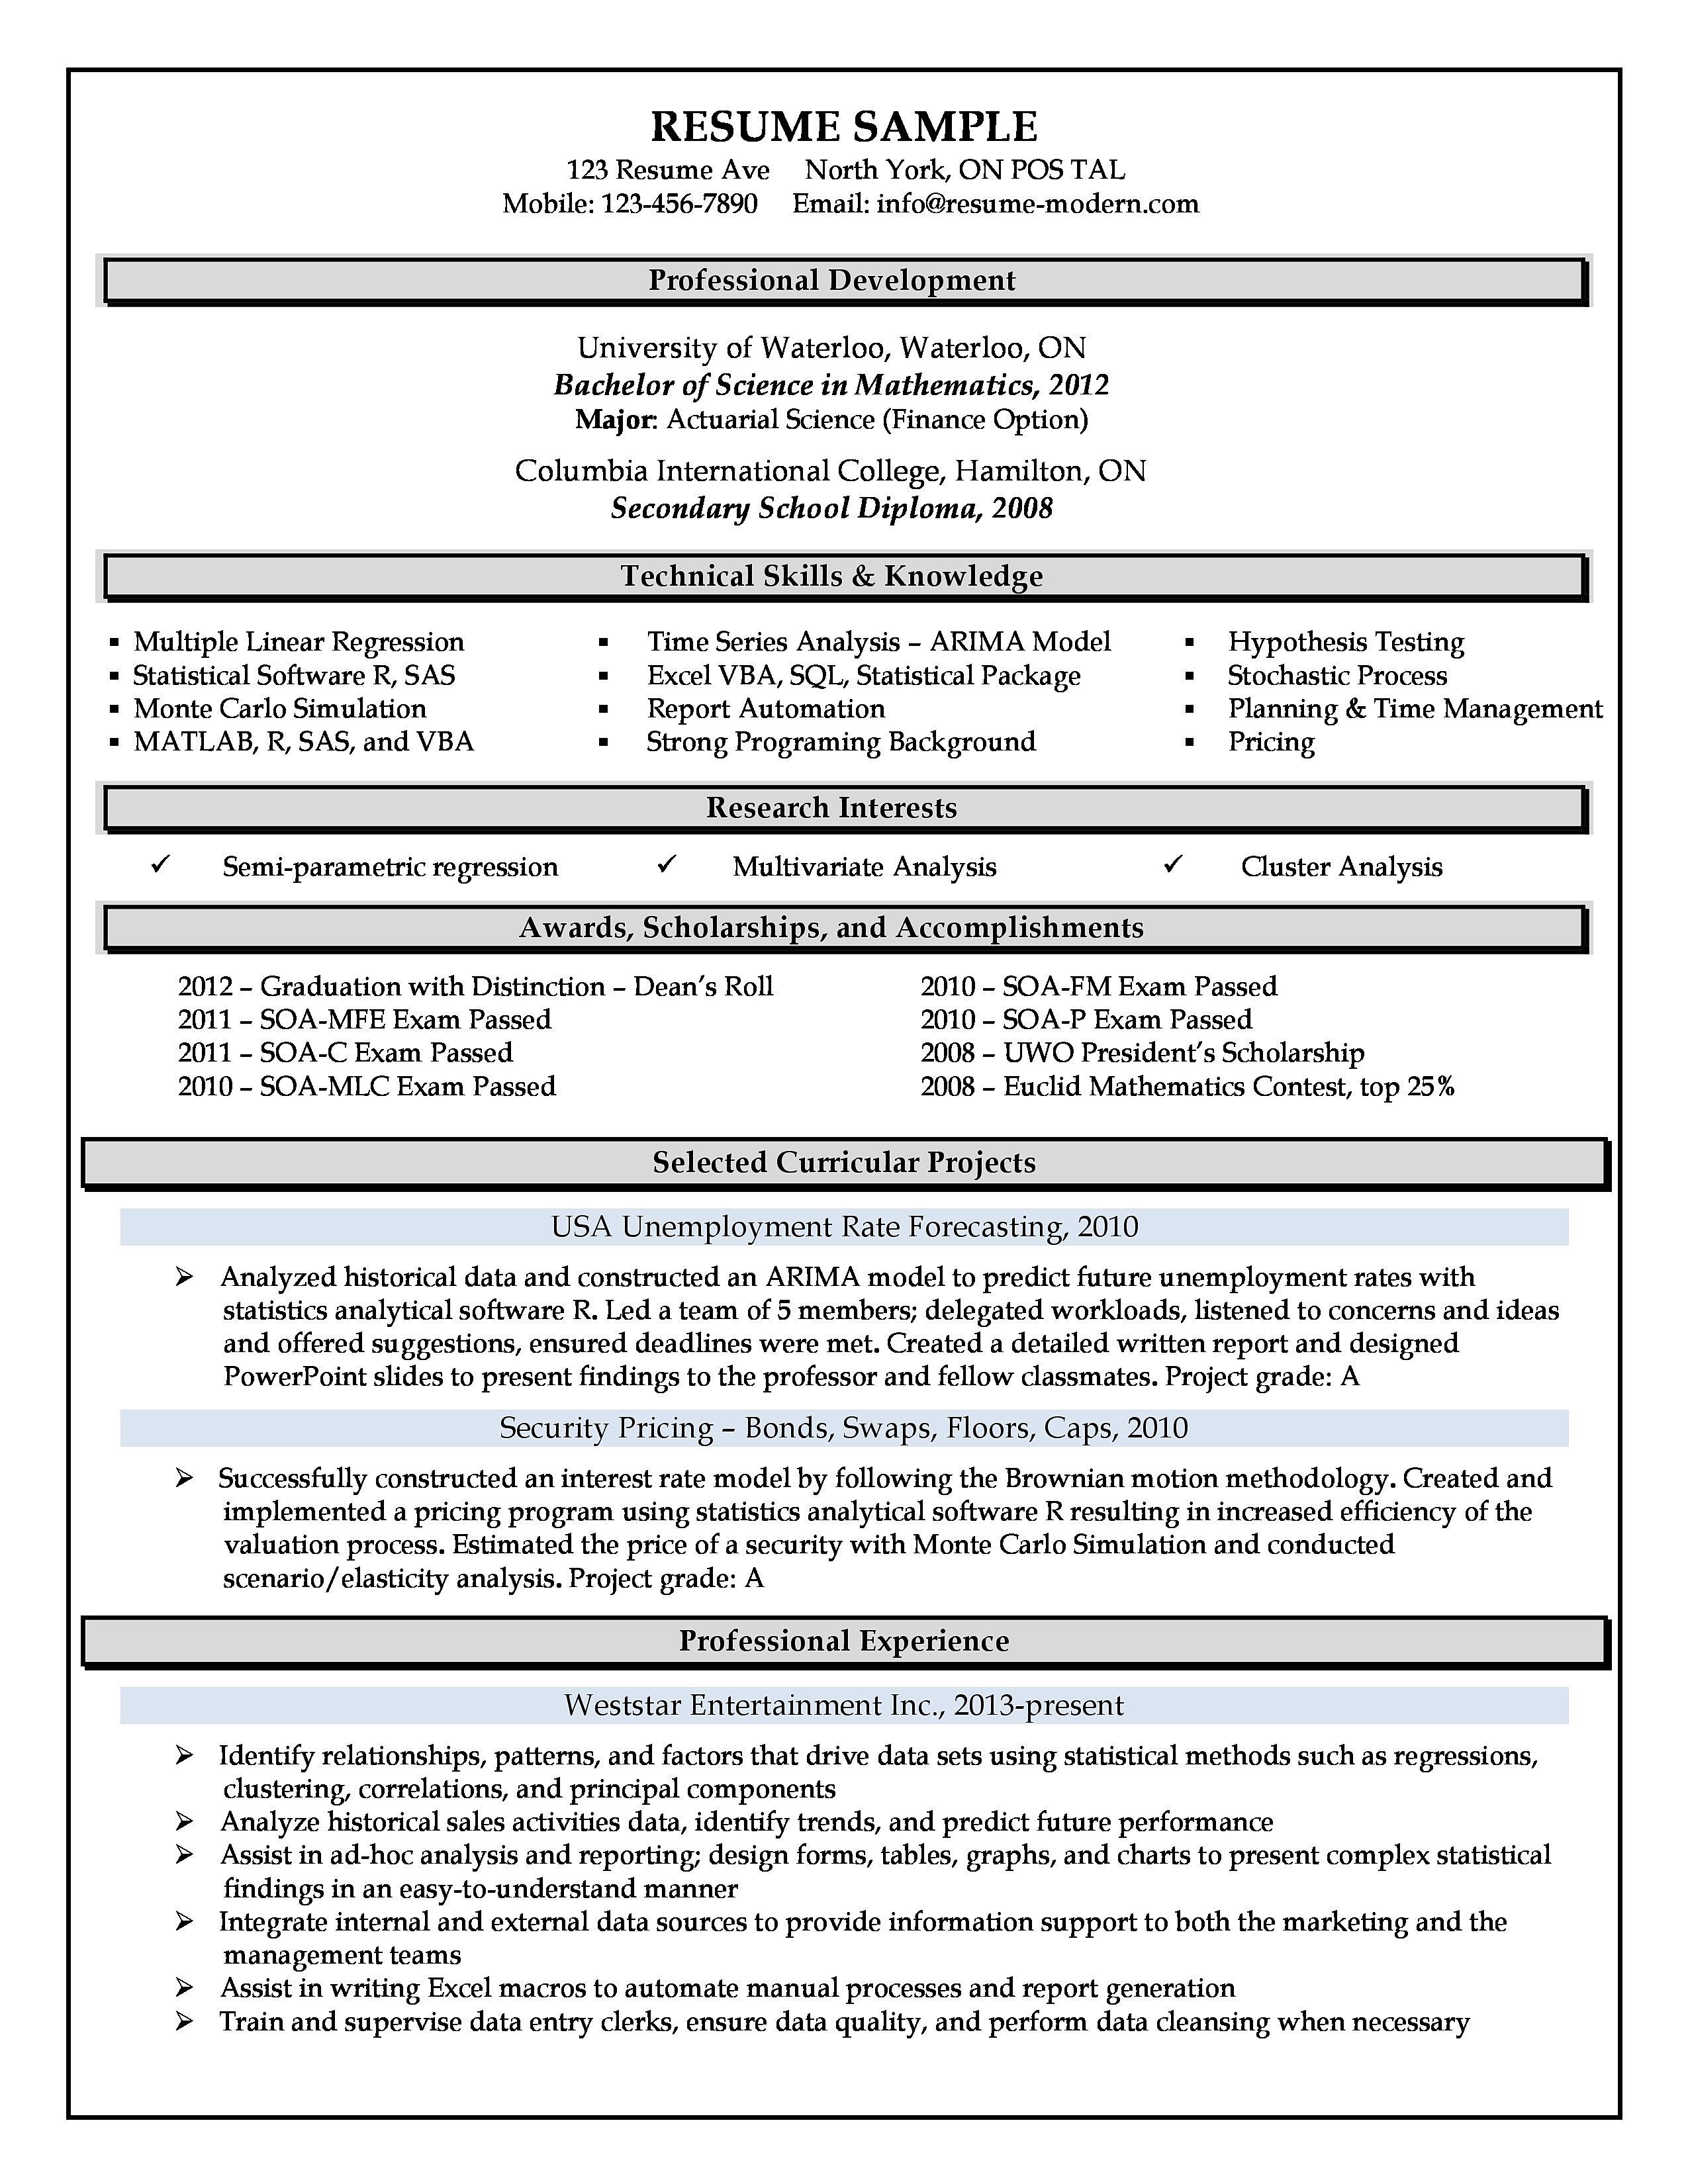 resume modern resume writing service by phds